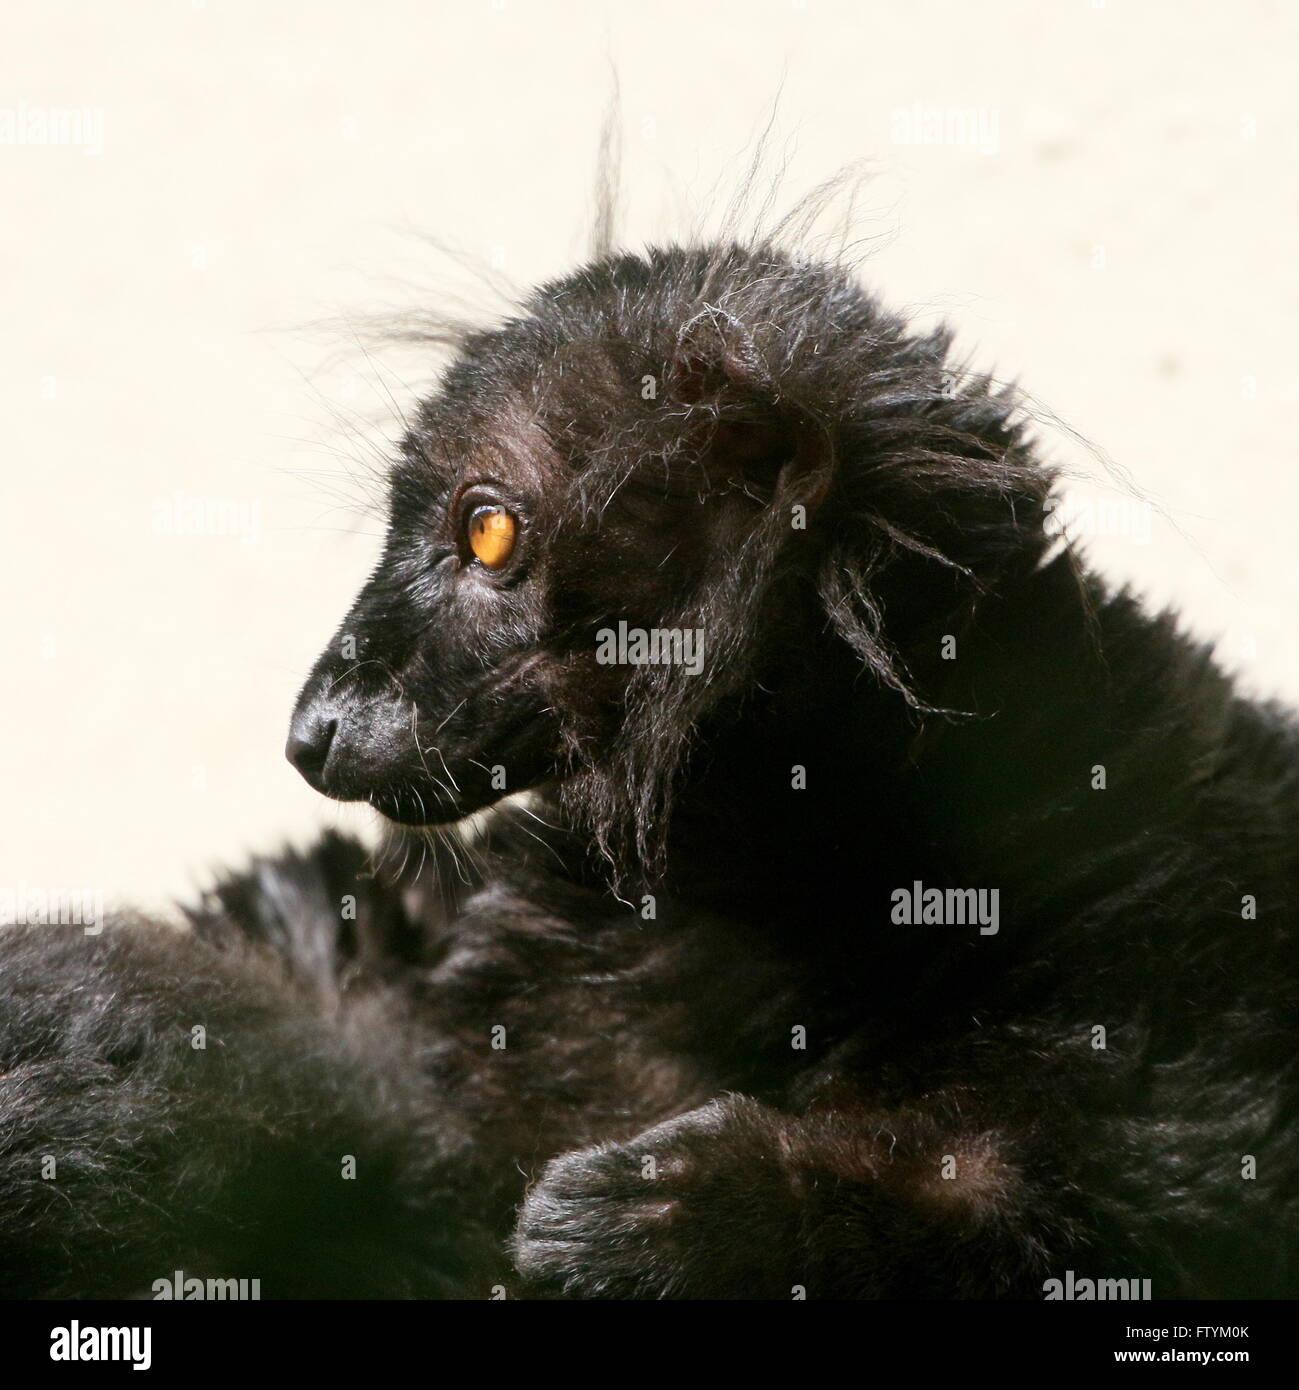 Close-up of a male Madagascan Black lemur (Eulemur macaco) - Stock Image